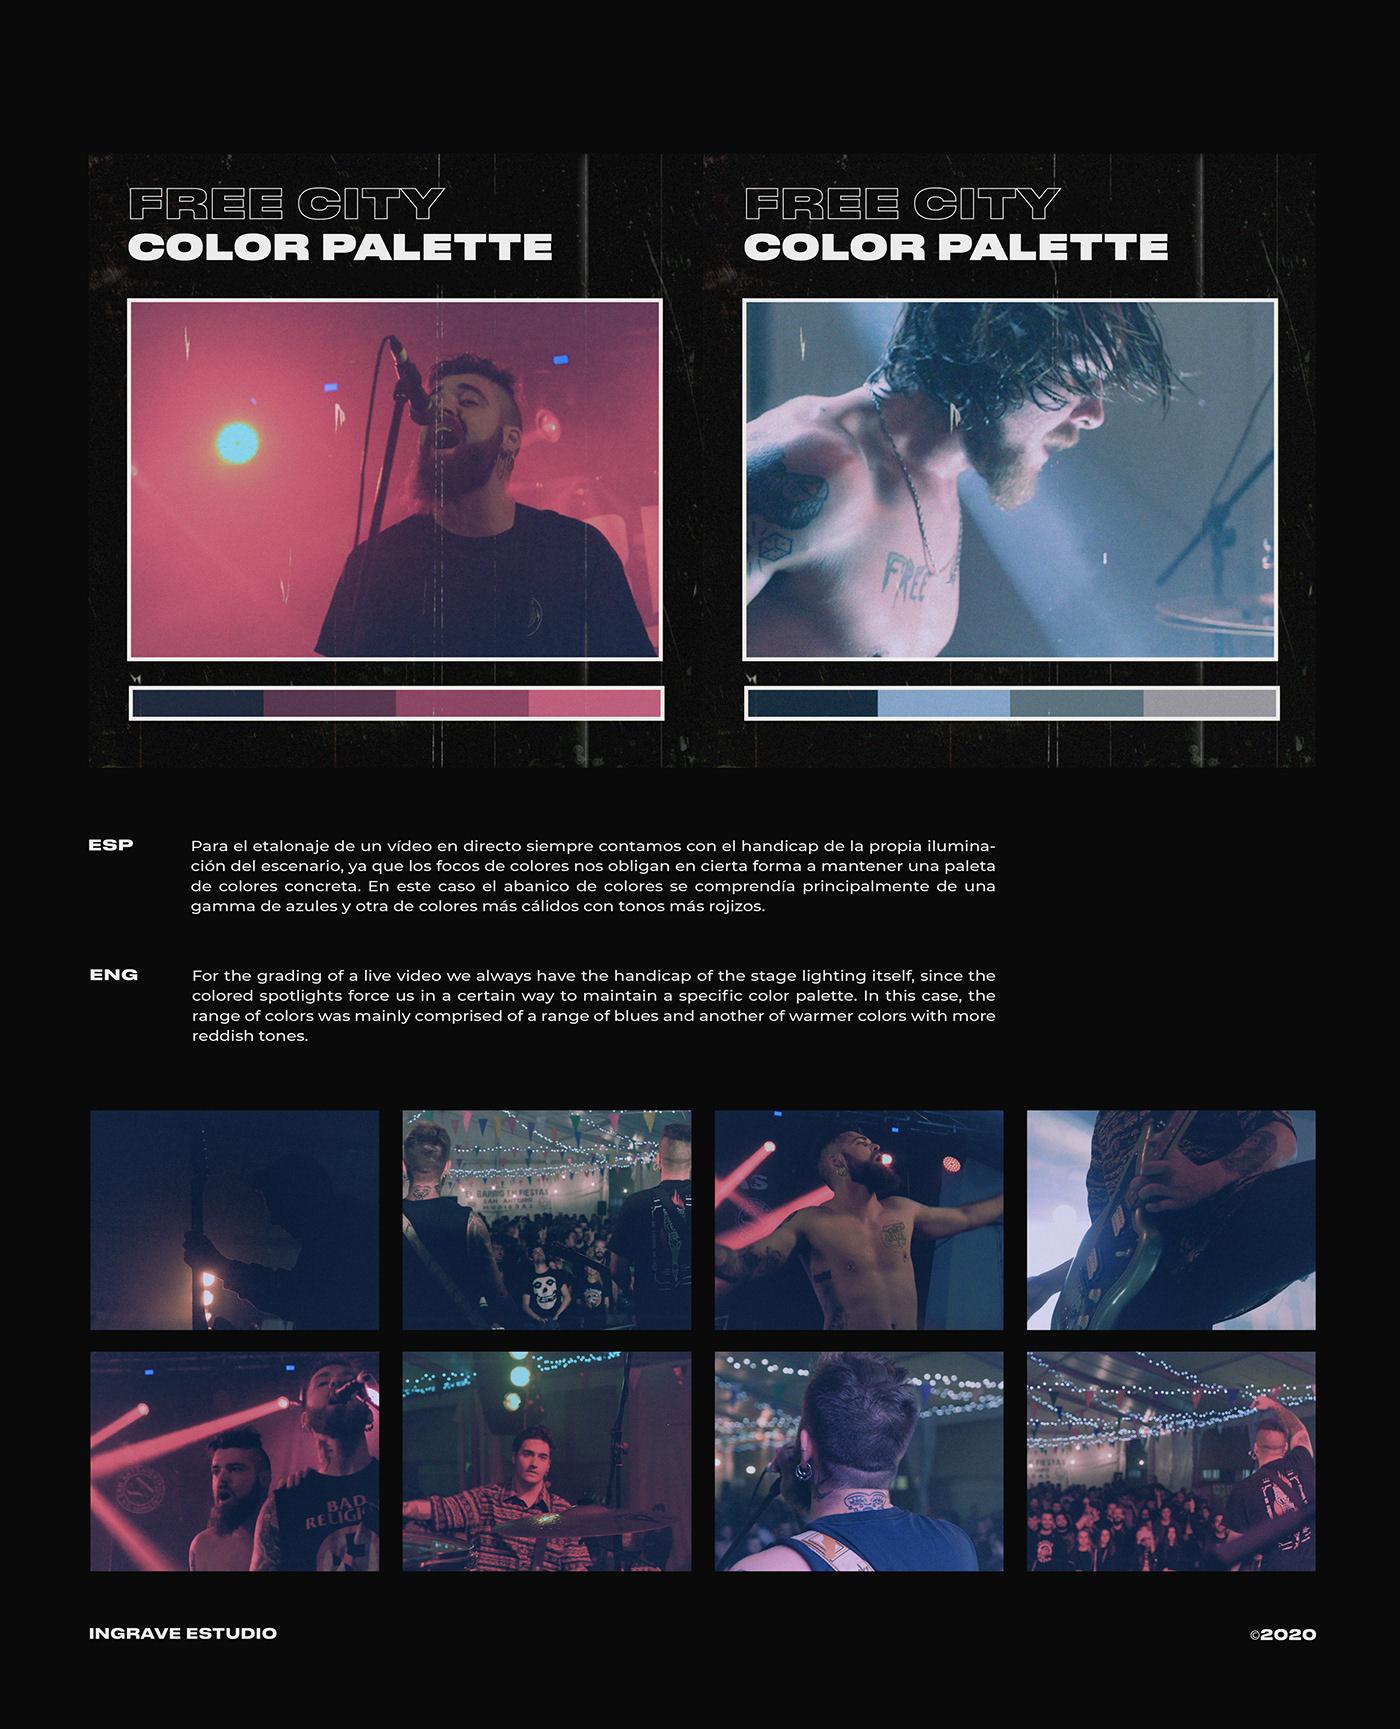 Filmmaker filmmaking live video music music video RONIN S Videoclip